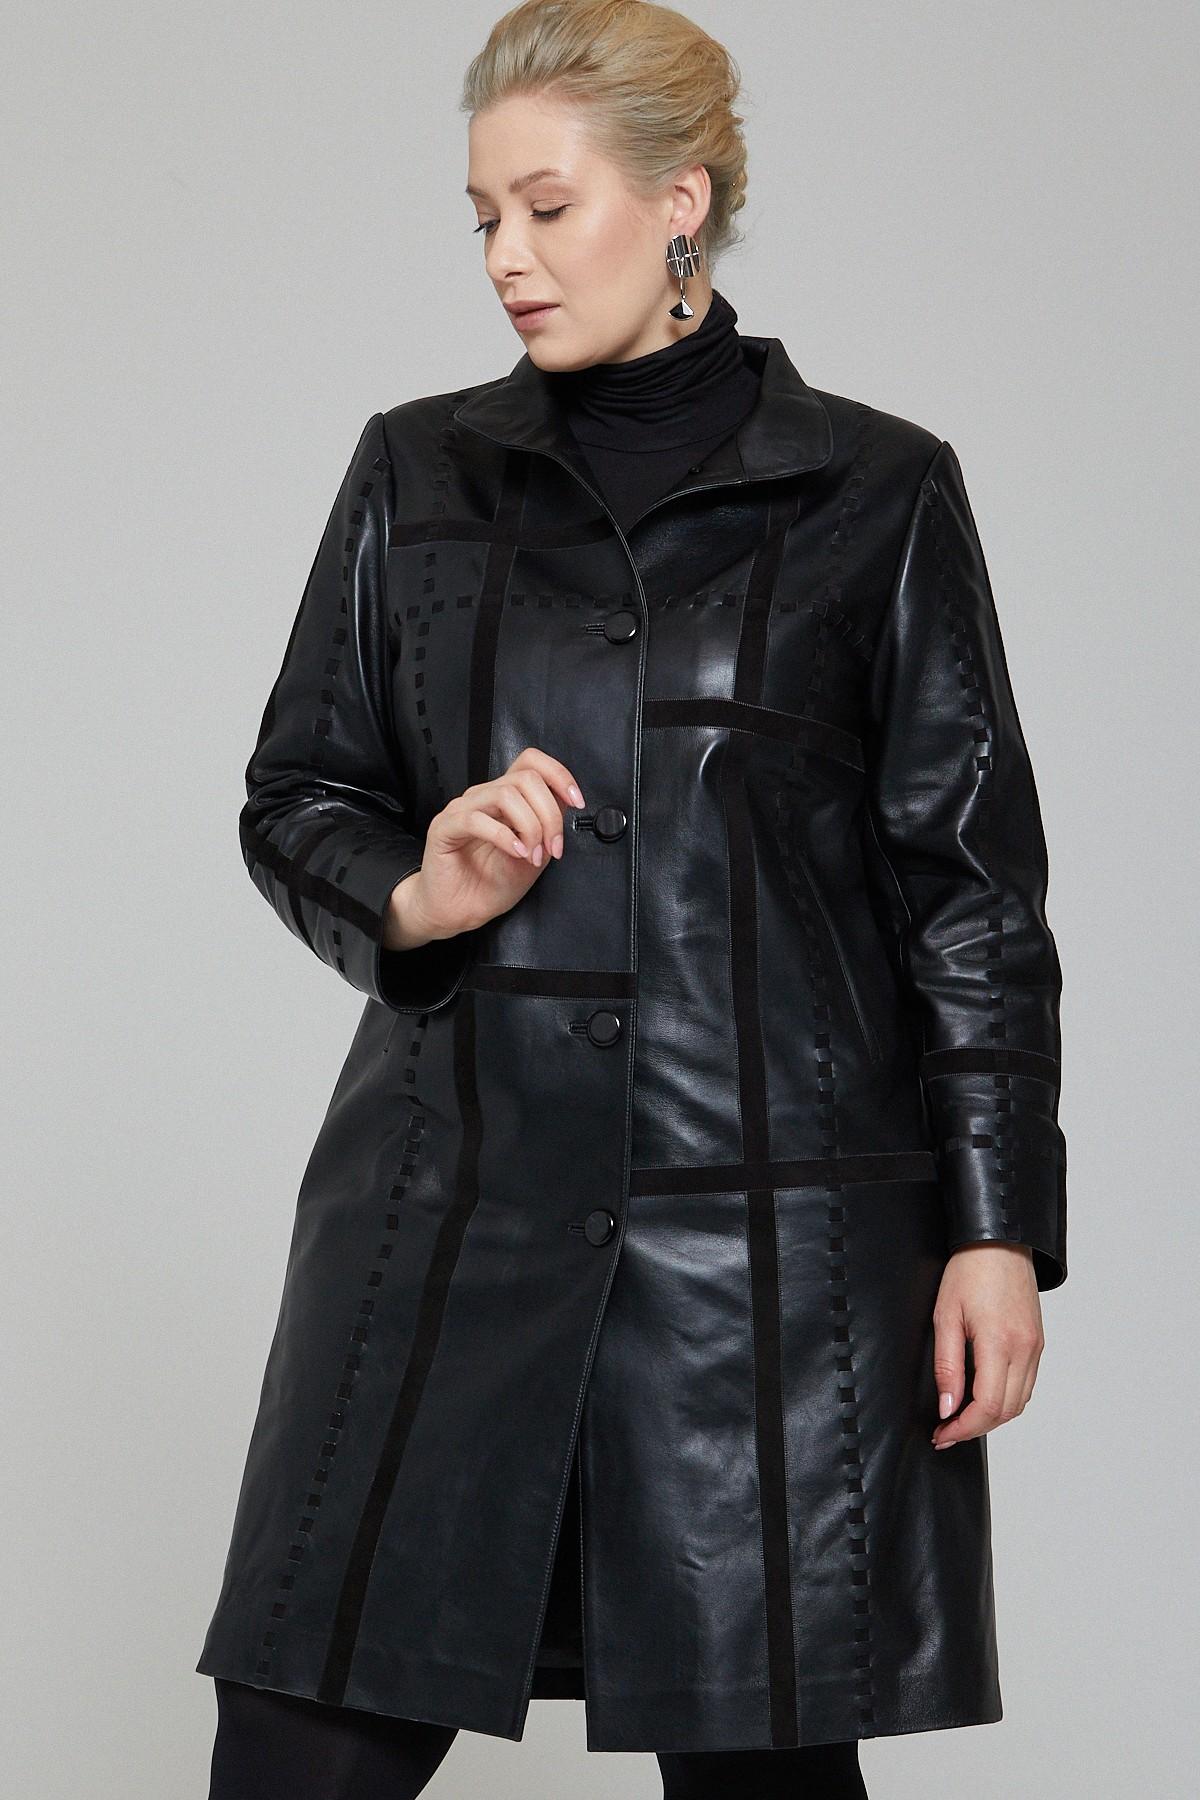 Kendall Jenner Long Leather Jacket